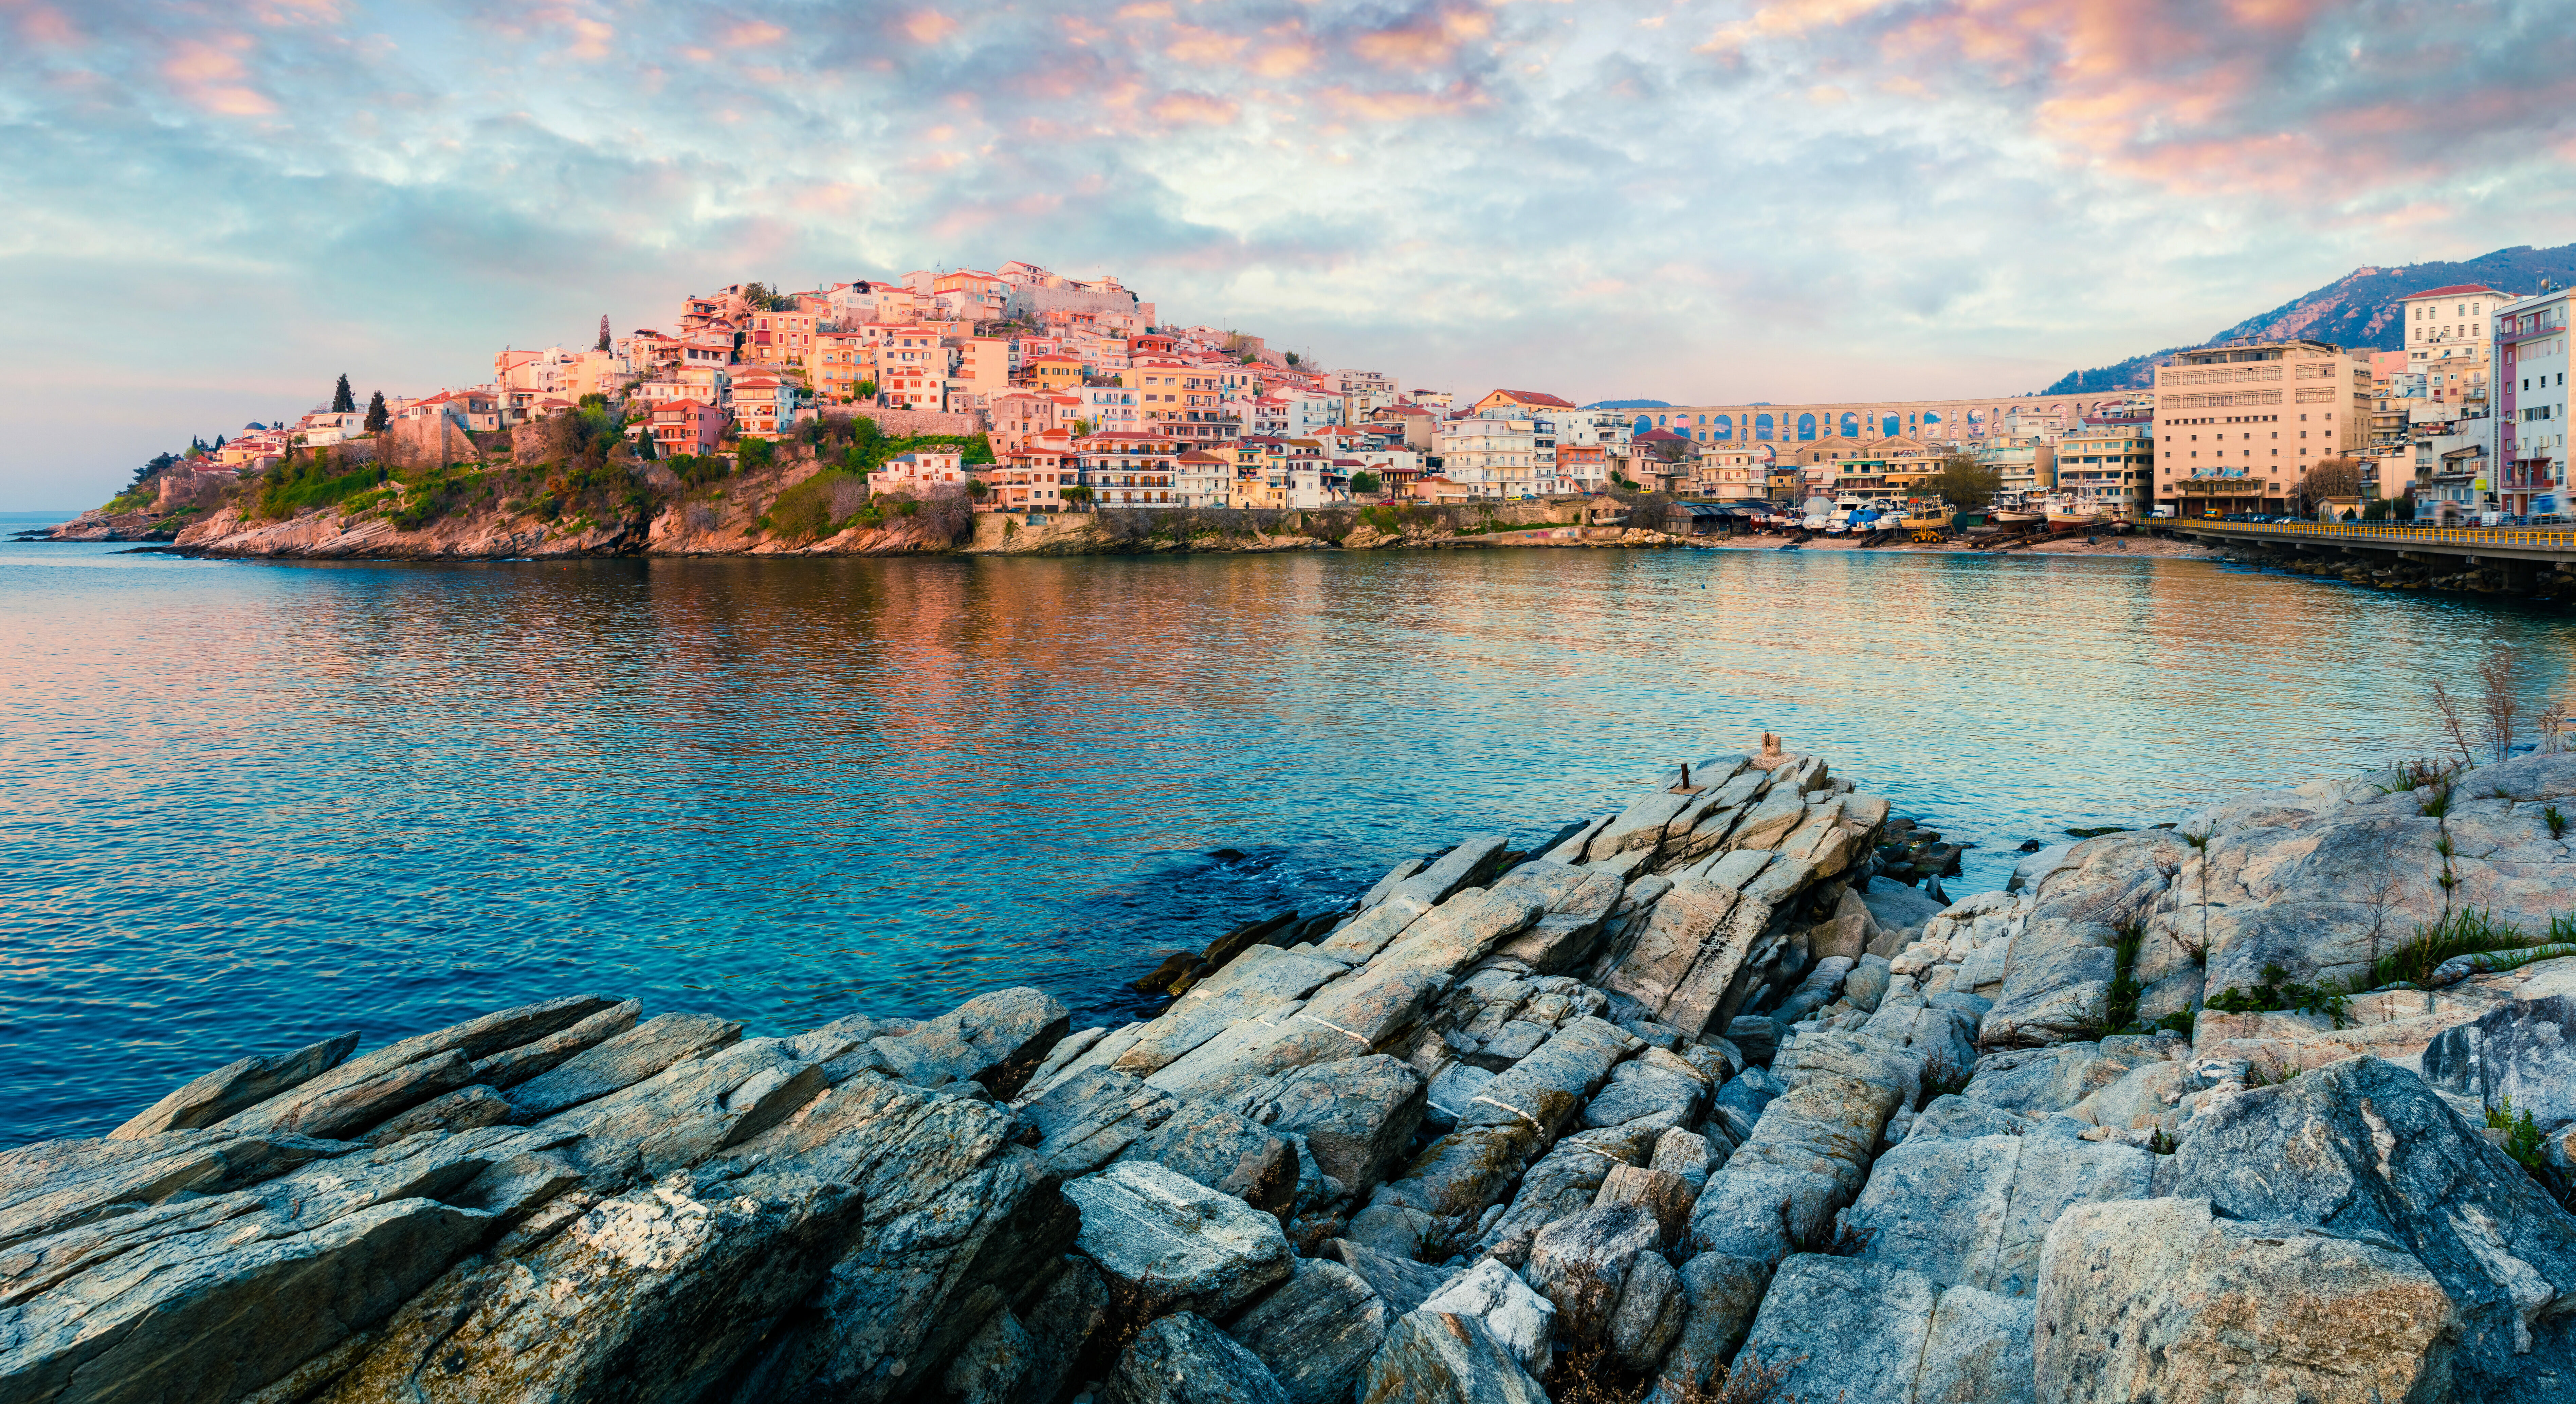 Kiltiritsa: A gastranomic trip to Kavala